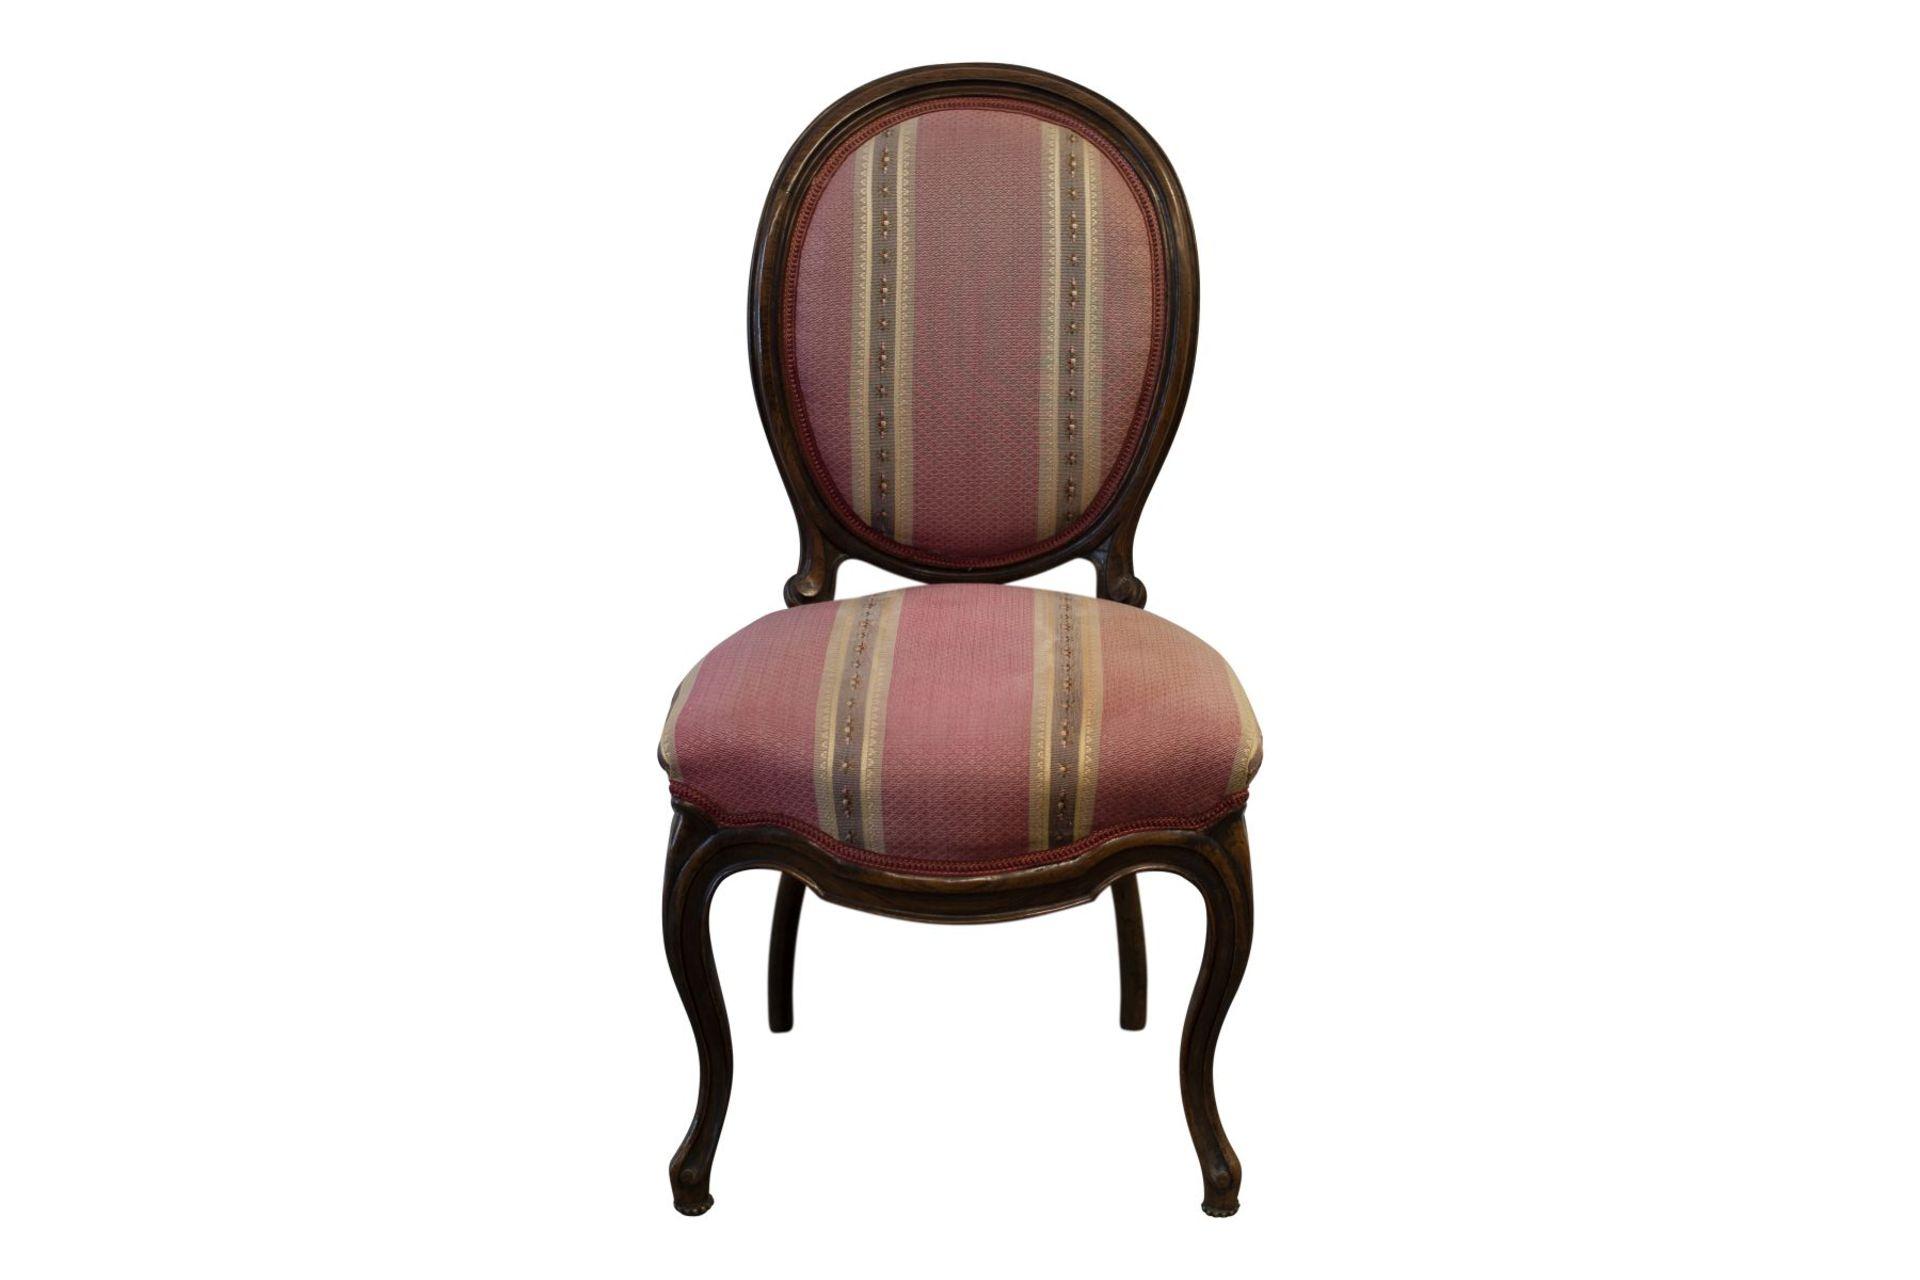 Salon Chairs Biedermeier - Bild 2 aus 8